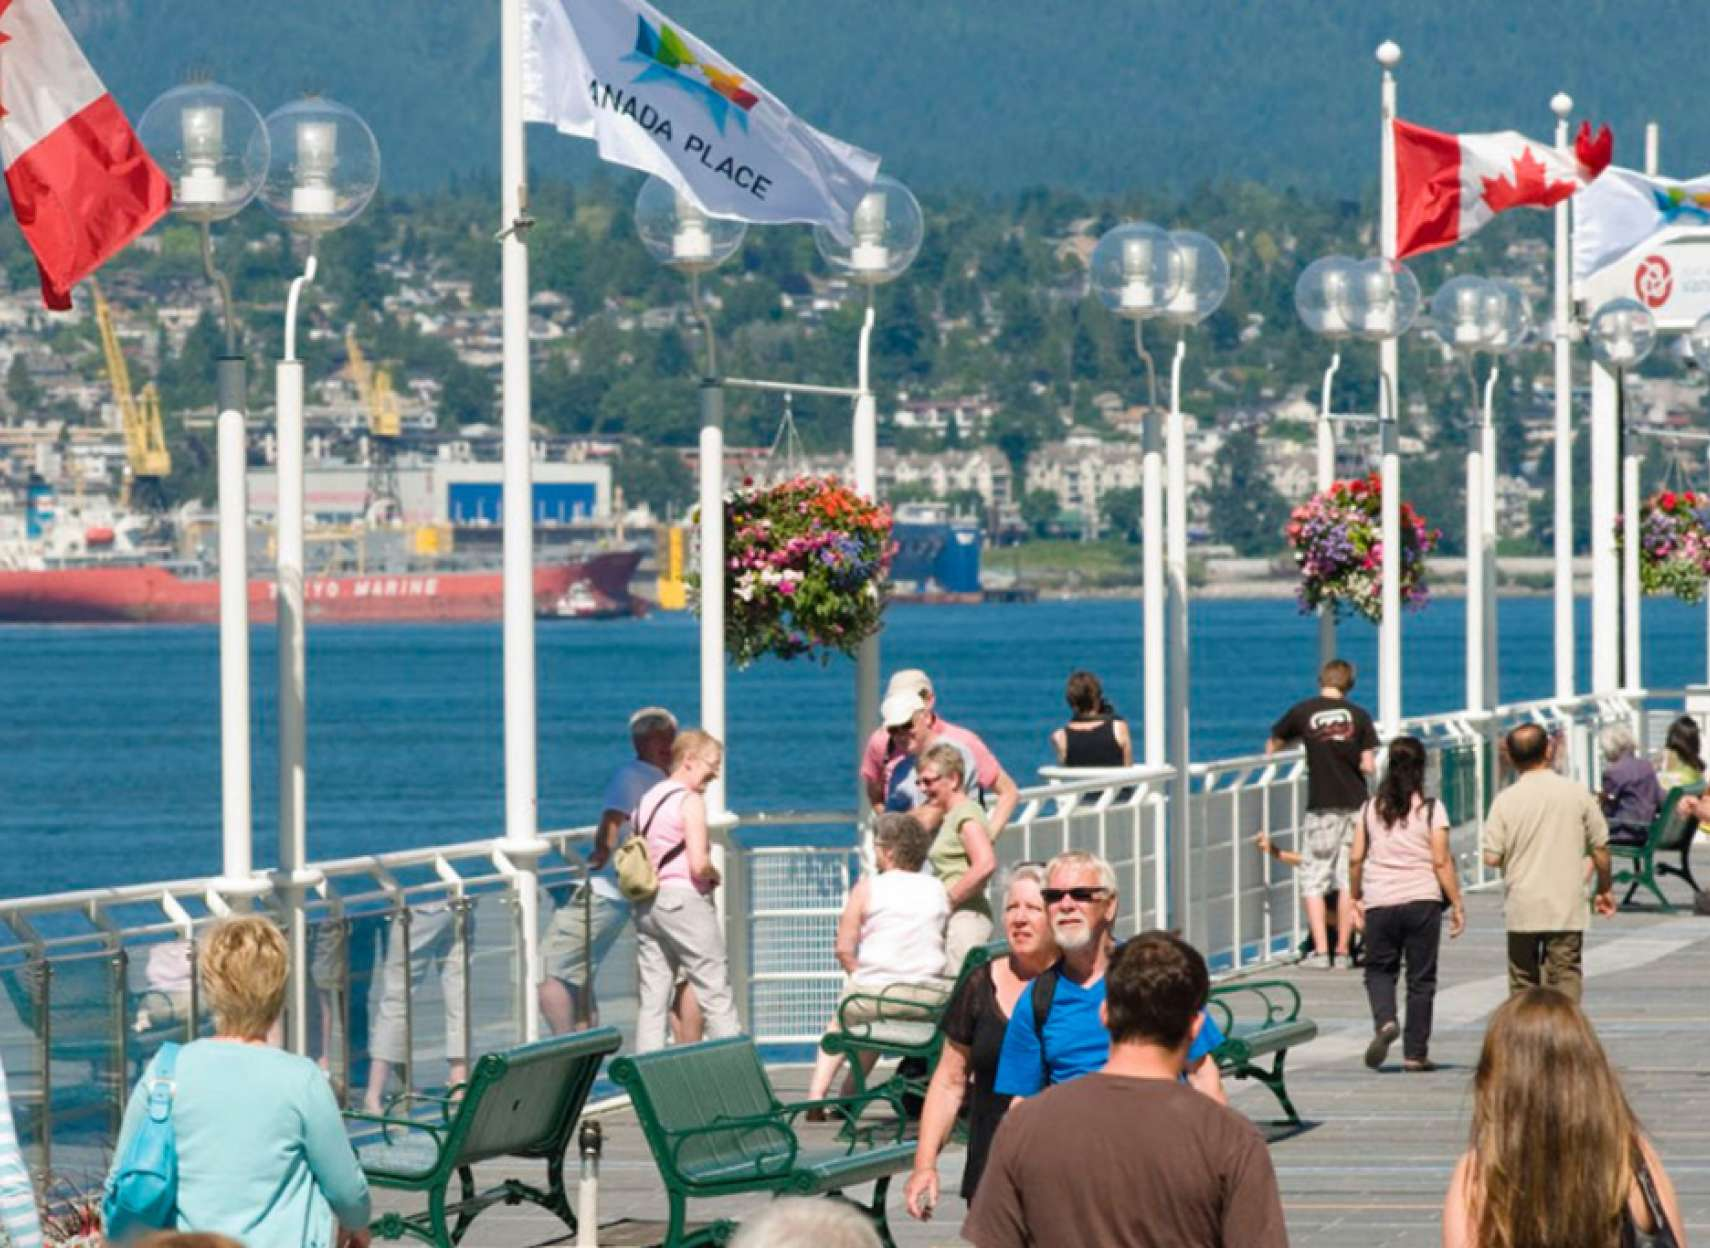 برنامه-جدید-مهاجرت-کانادا-چیست-کانادا-اخبار